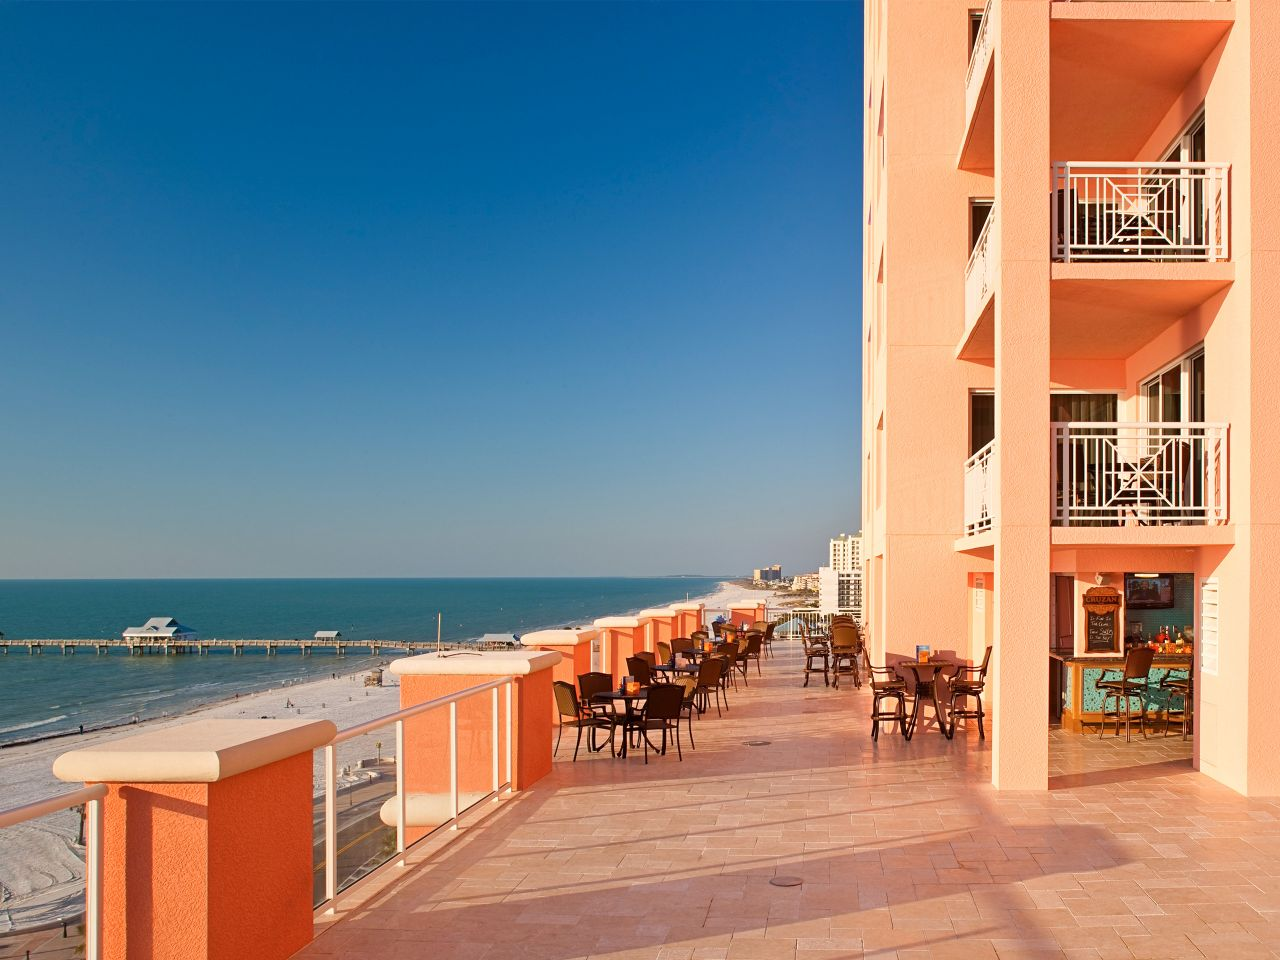 Outside bar on terrace overlooking beachfront